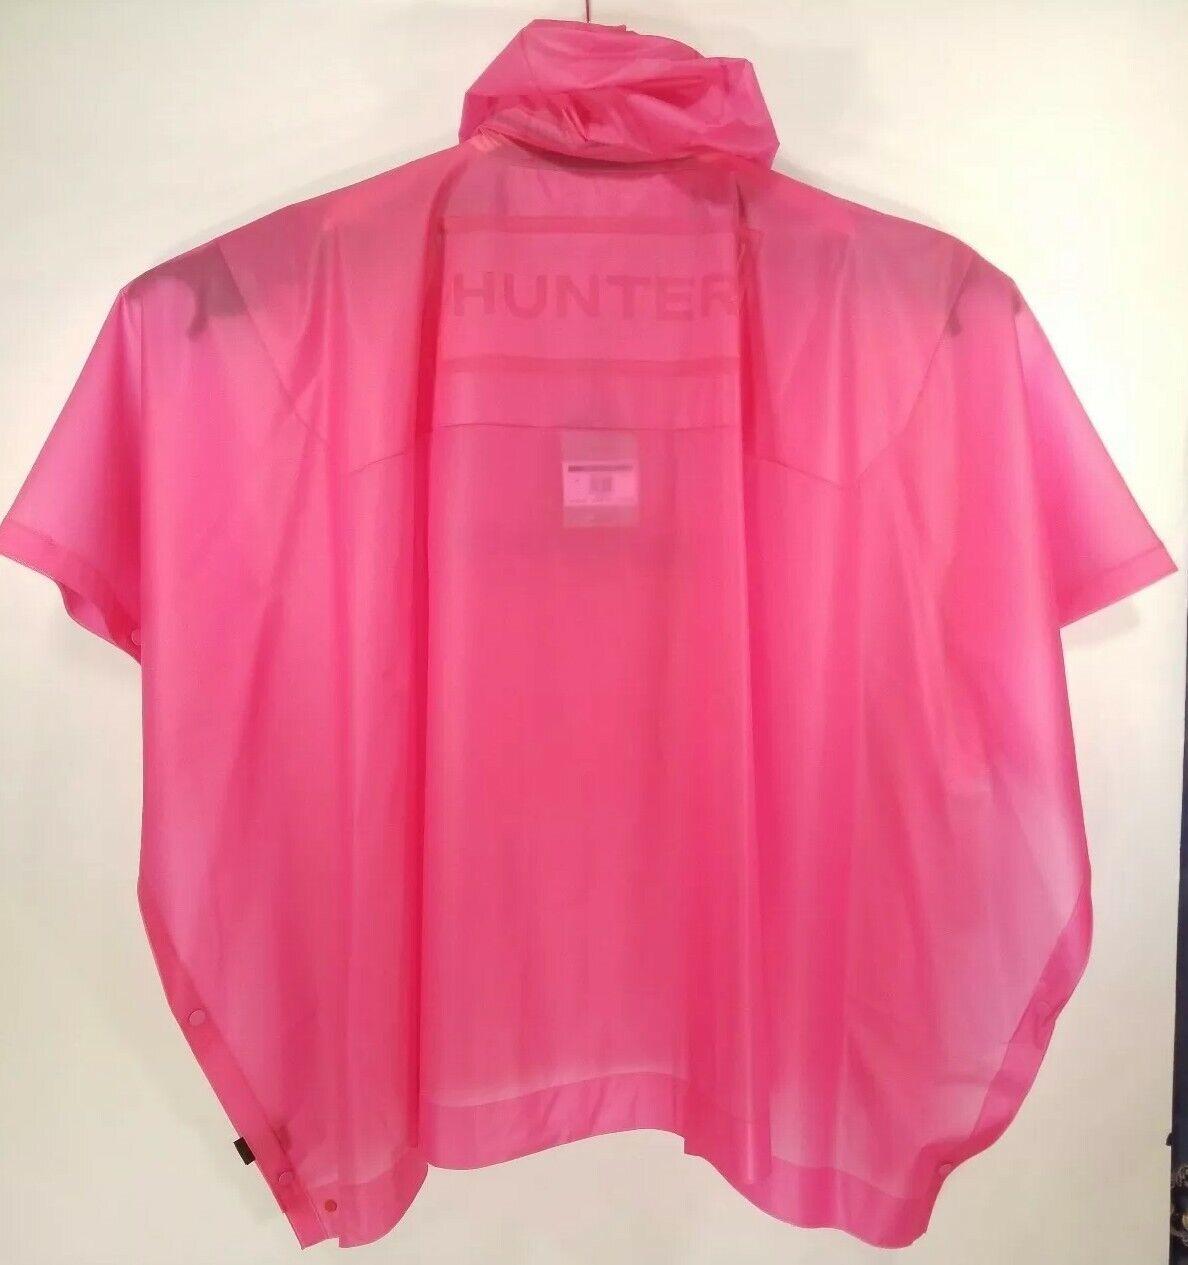 Hunter XS  S Unisex Original Vinyl Poncho Pink Fushcia Outdoor Festival Raincoat